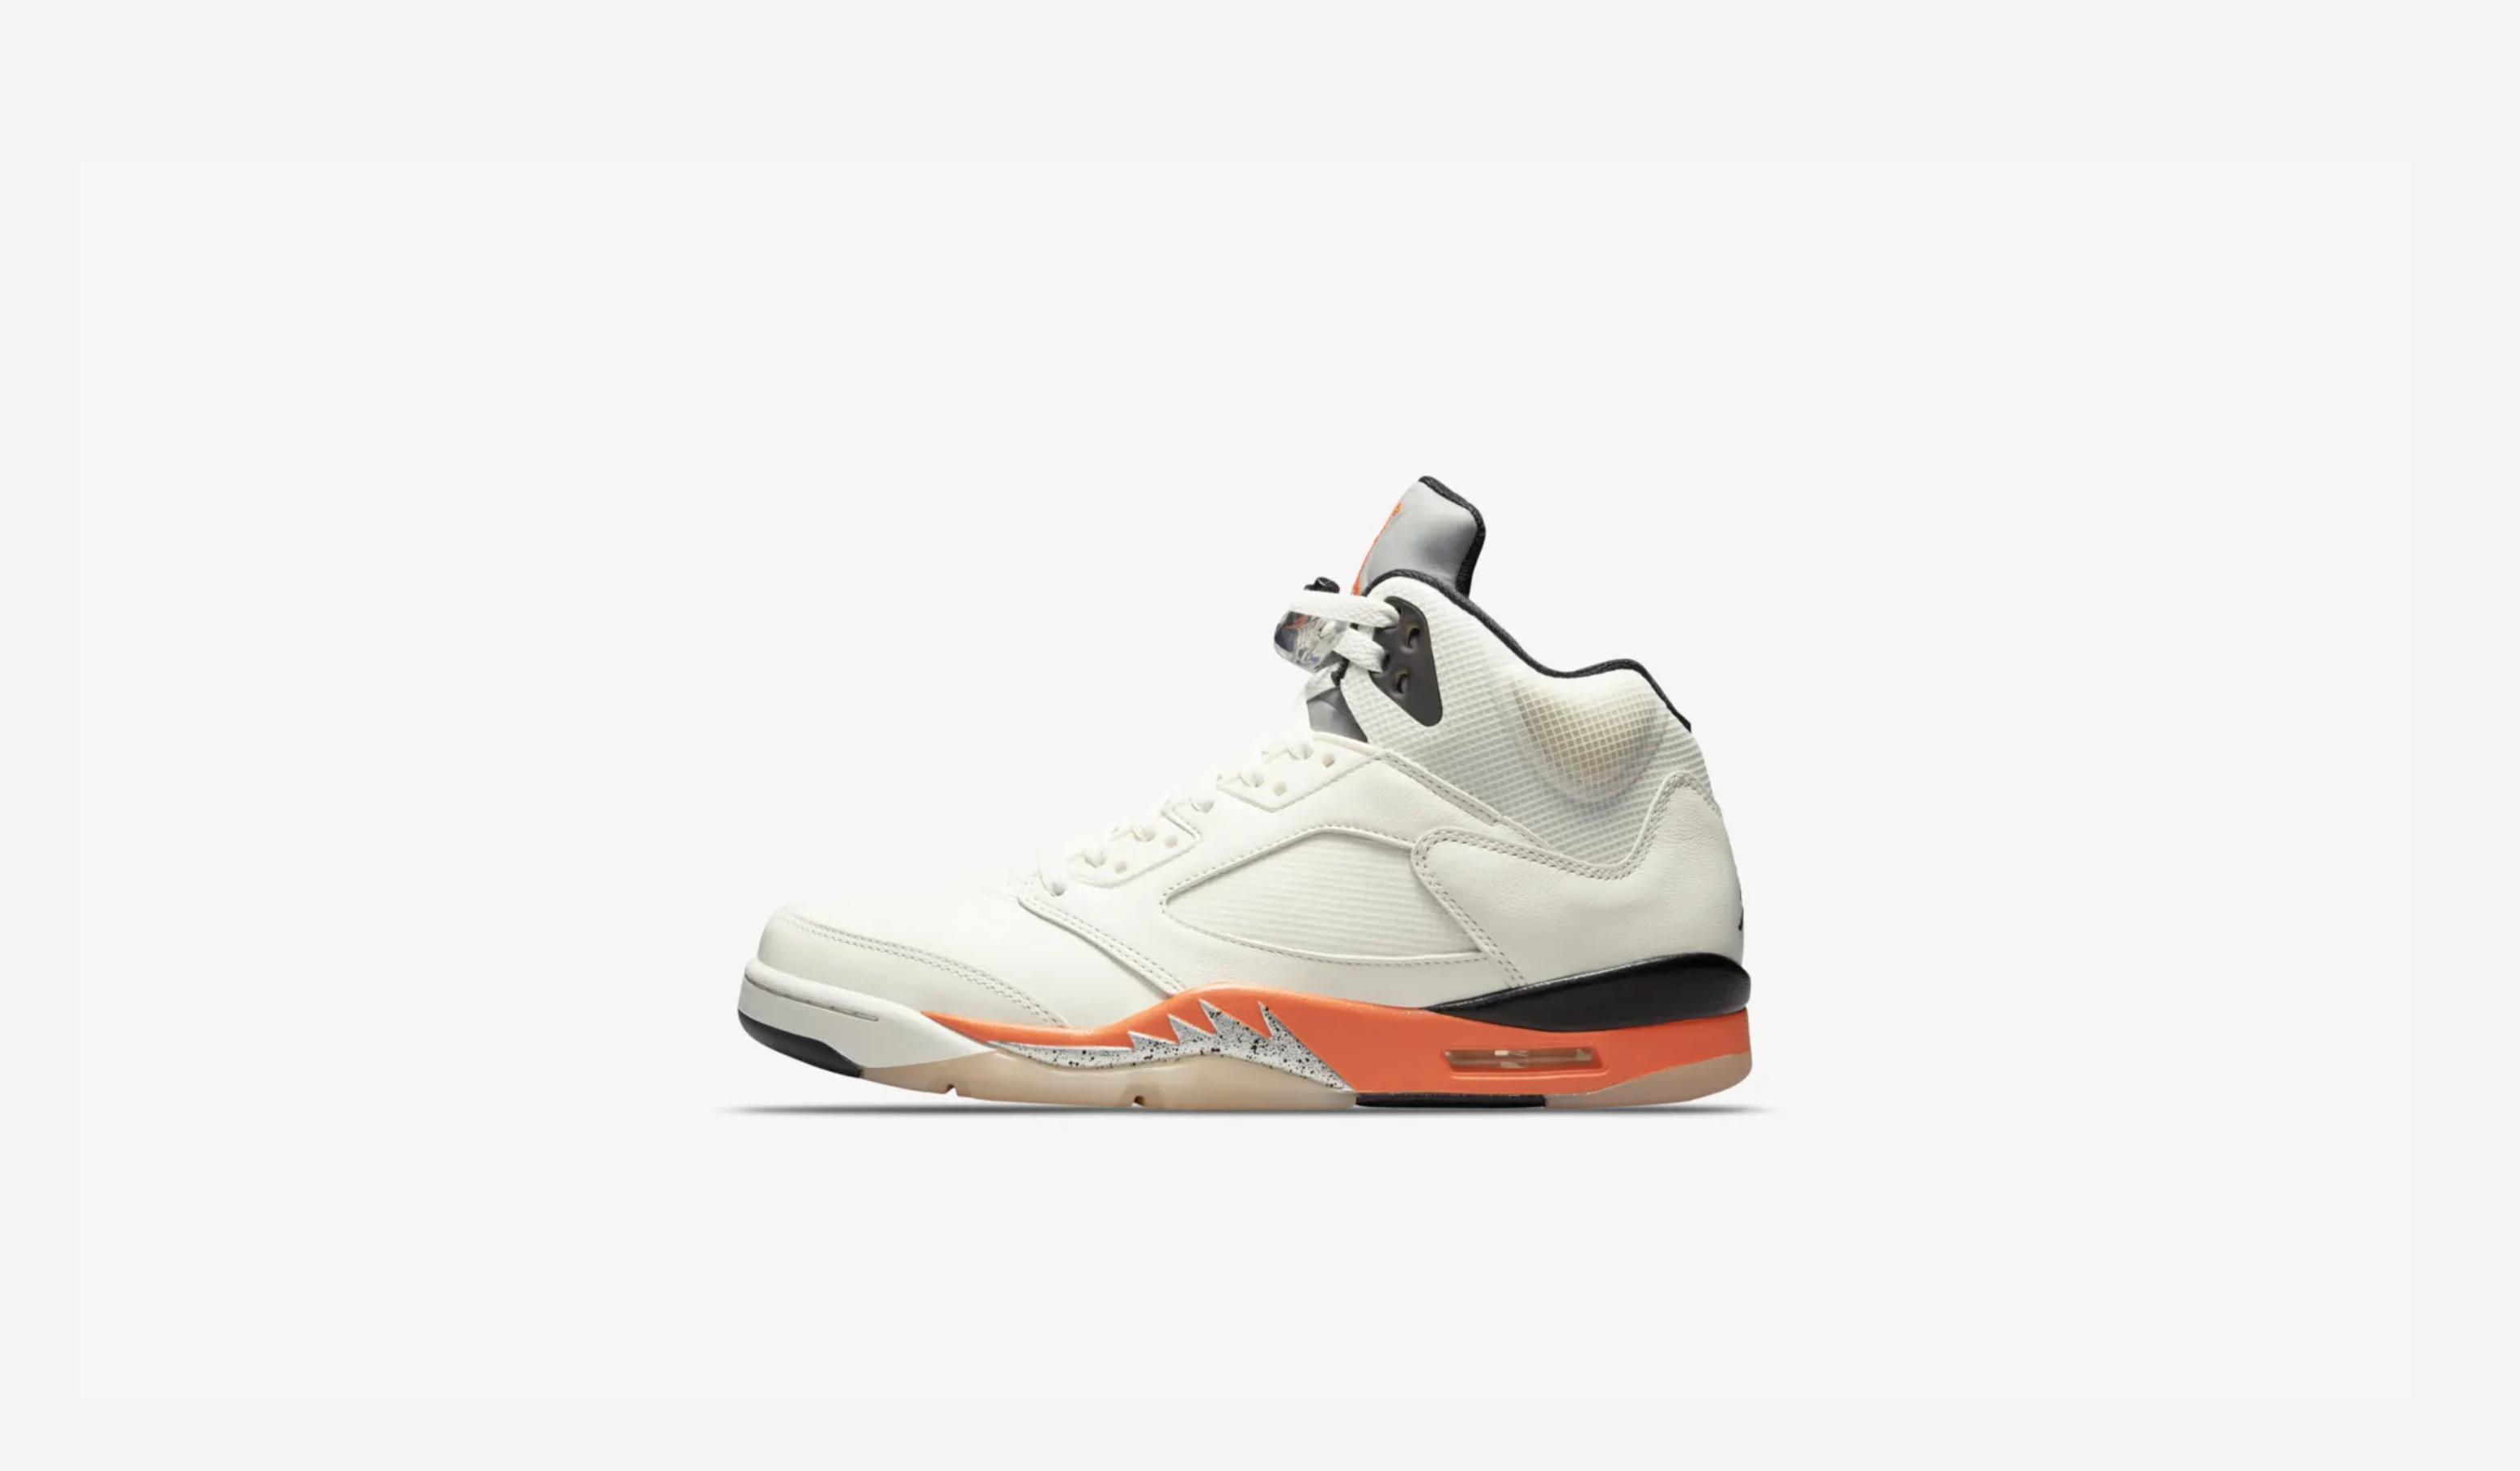 Air Jordan 5 'Shattered Backboard - Nieuwe heren sneakers